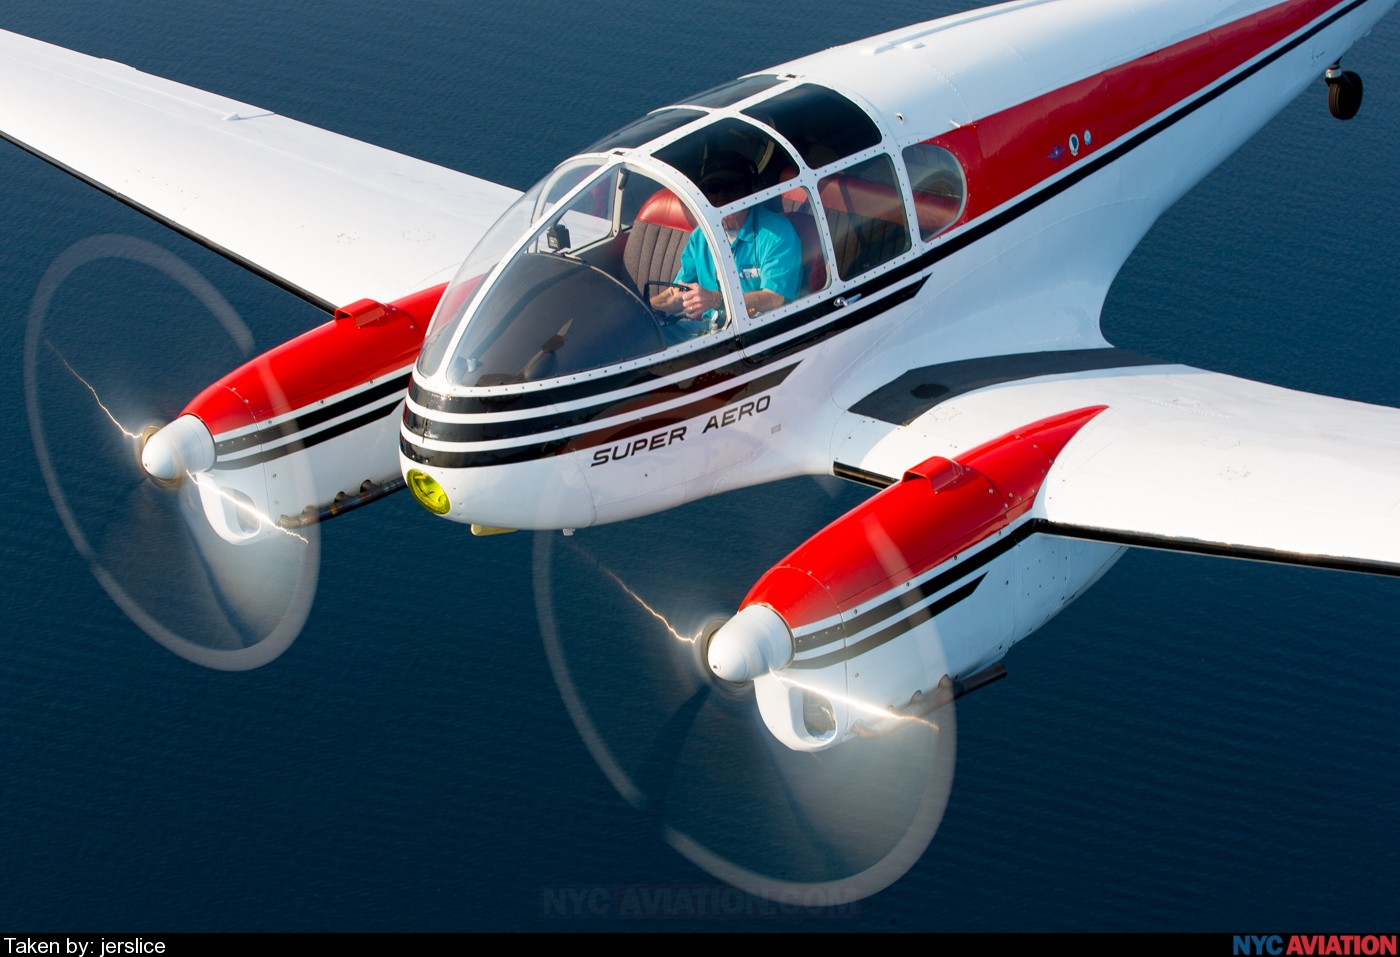 rGze2fuLYI-2-17_09_03 Aero45 1400-18.jpg